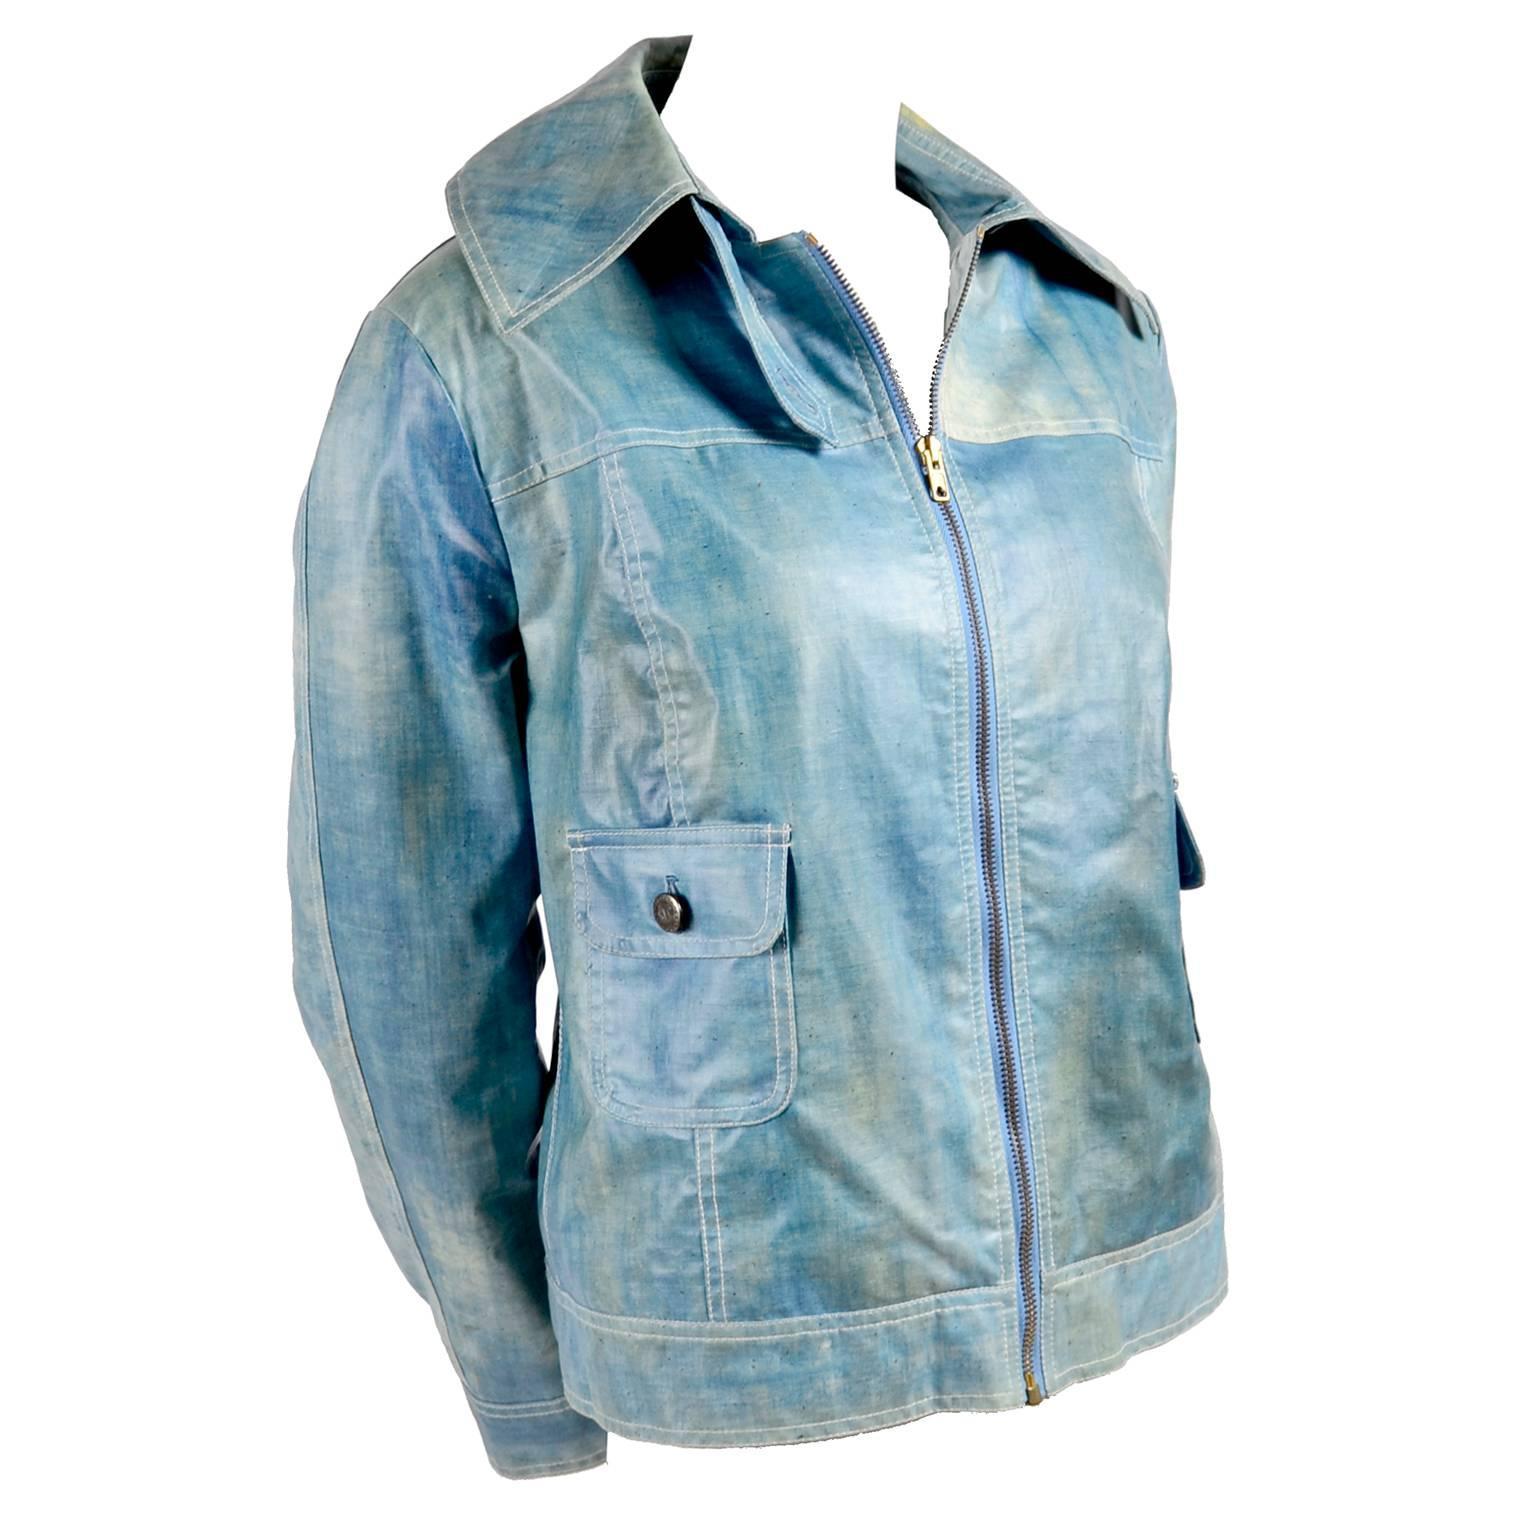 Designer Coated Vintage Denim Jacket W White Rabbit Fur Lining Eclair Zipper